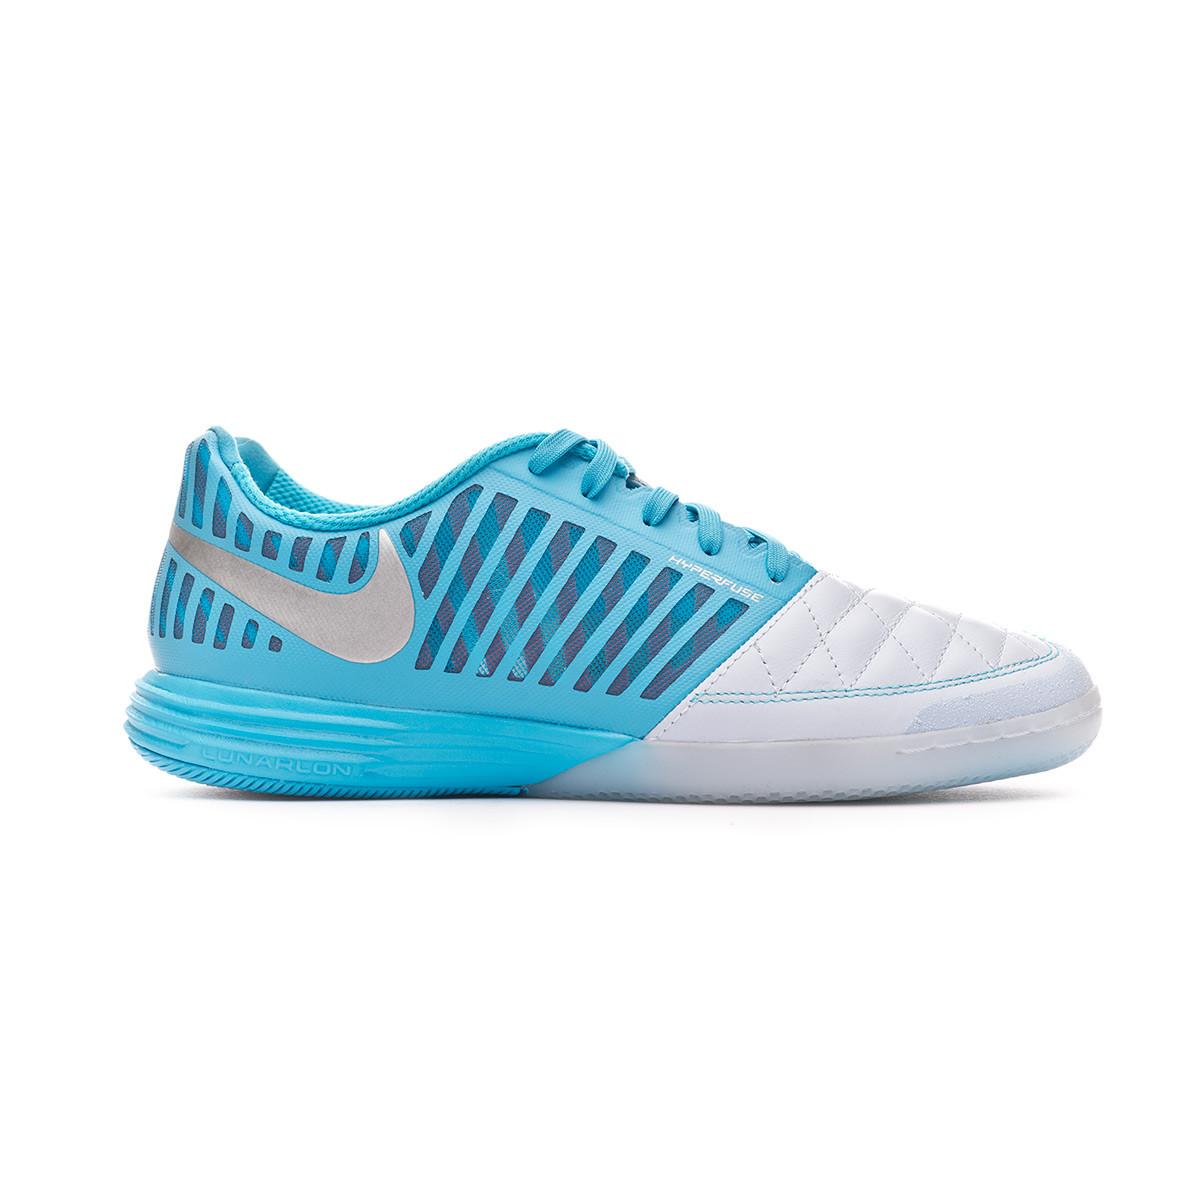 Sapatilha de Futsal Nike Lunar Gato II IC